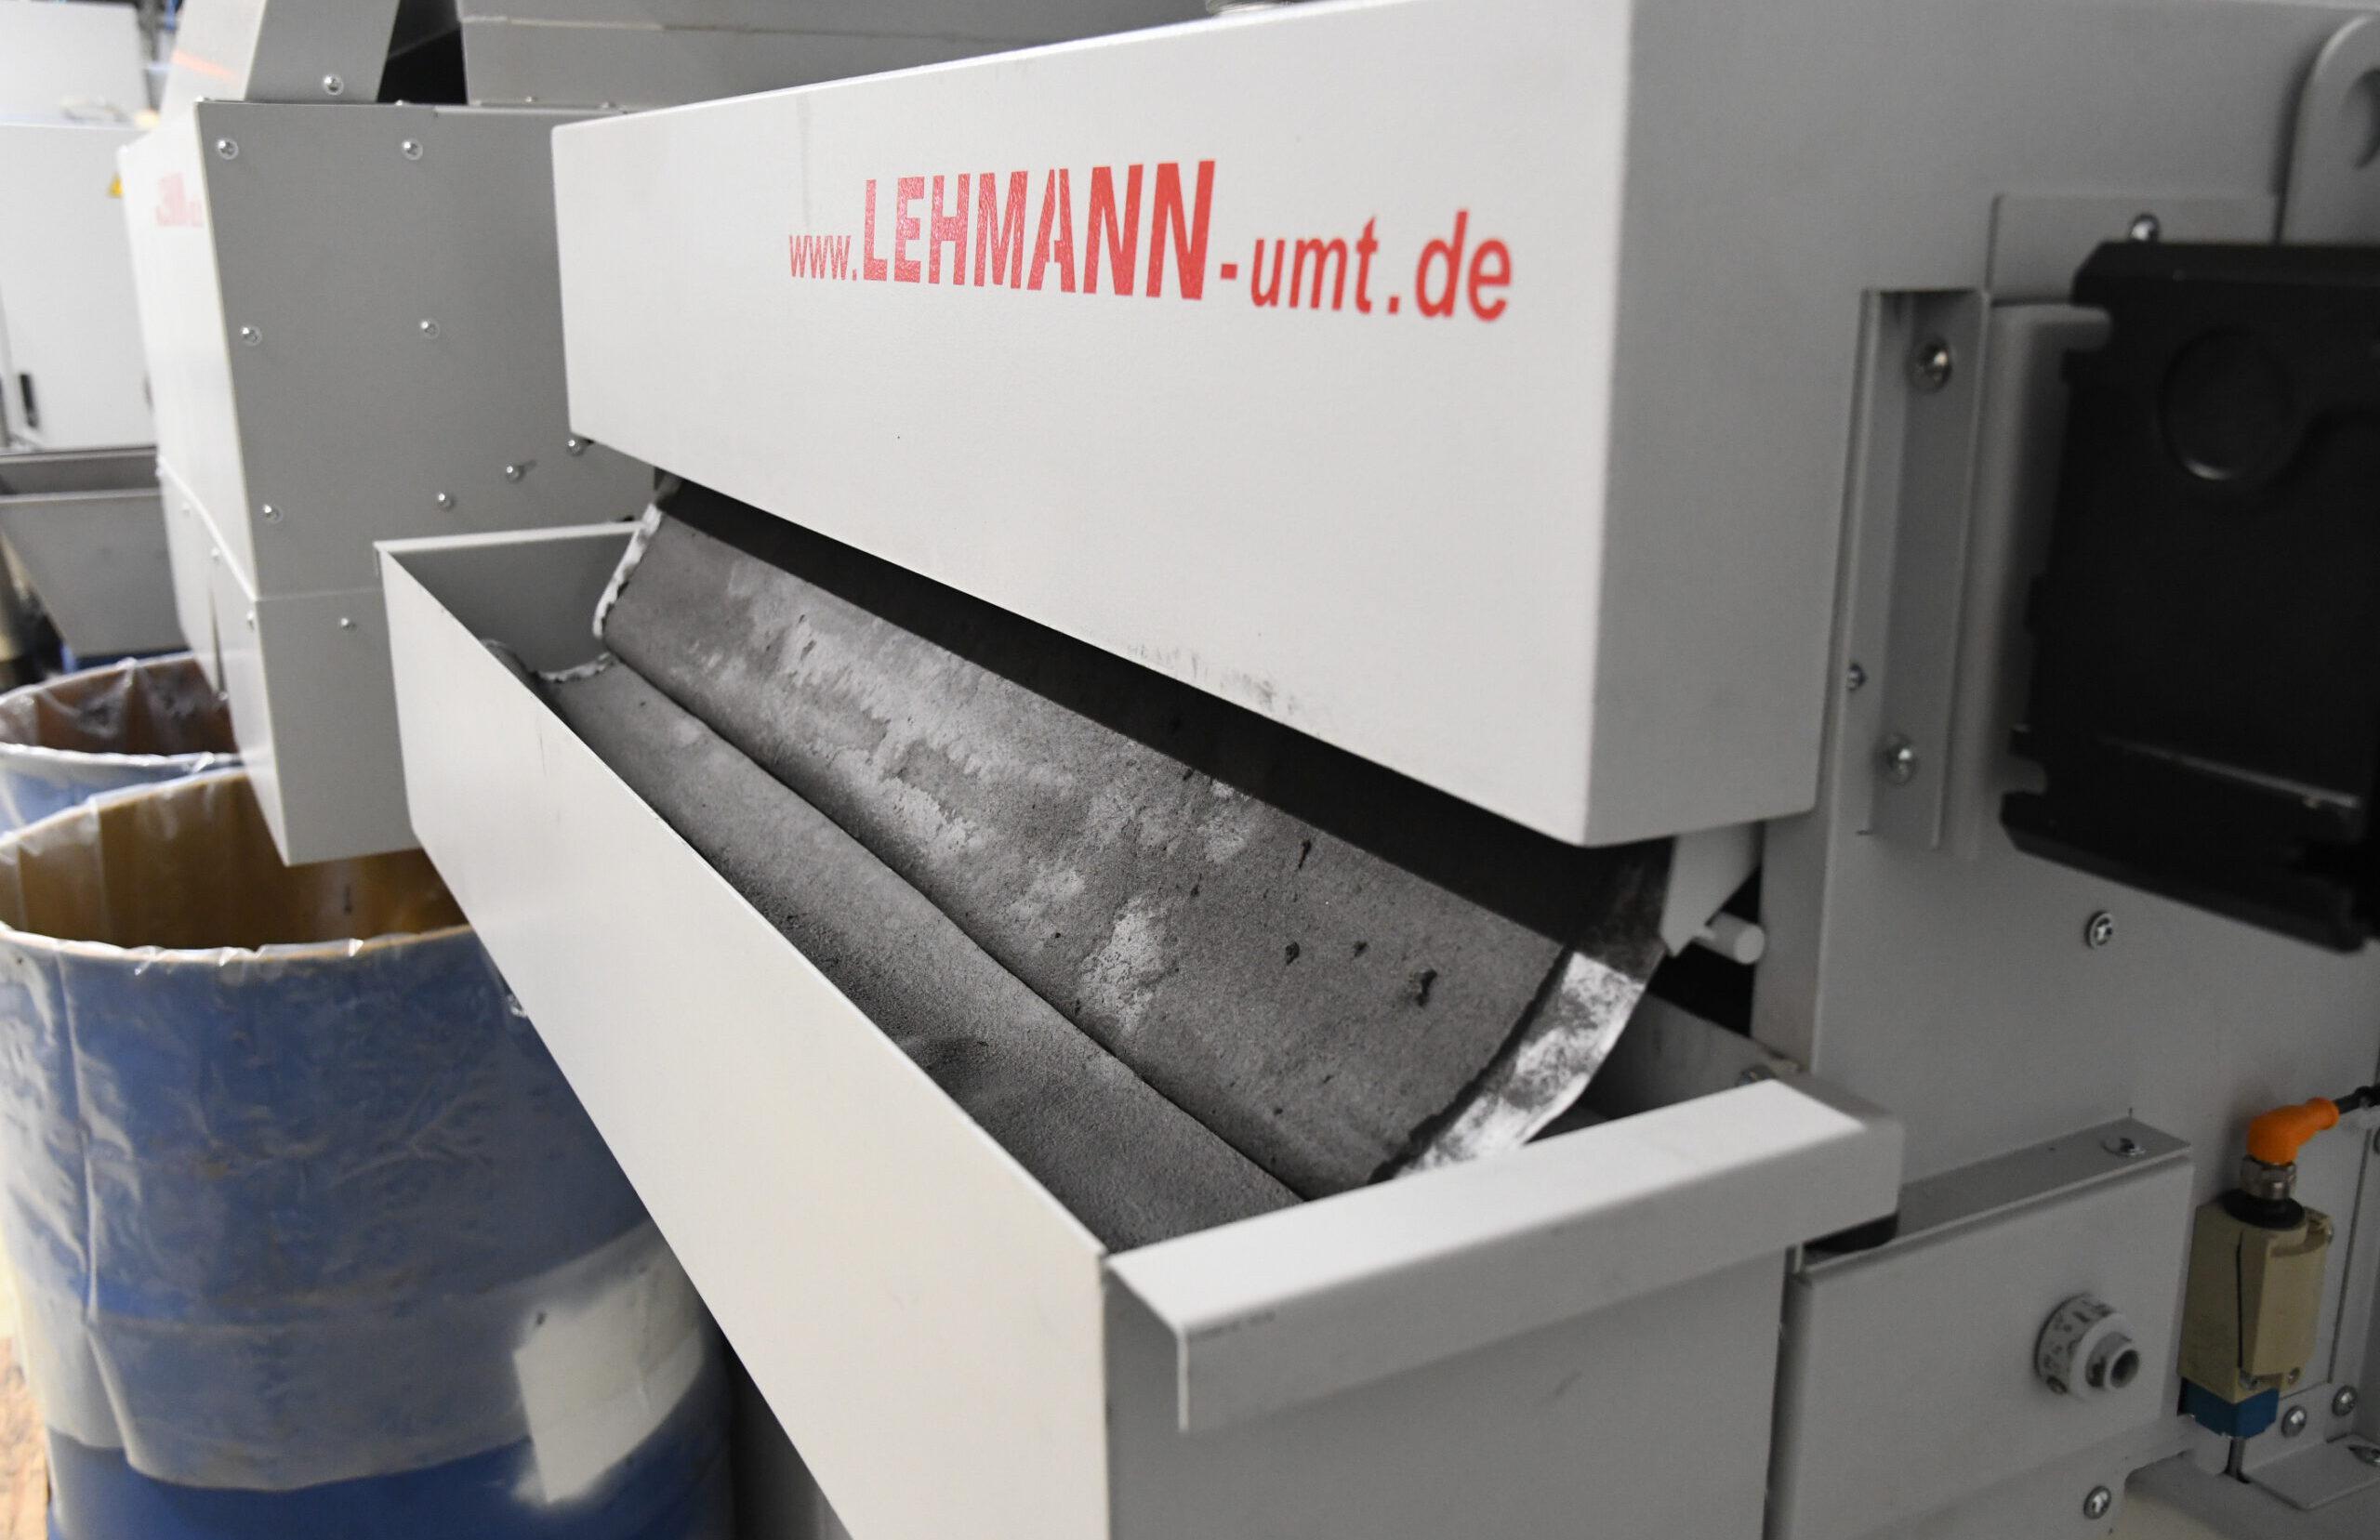 https://stingr.de/wp-content/uploads/2021/08/Anwenderbericht_Lehmann-UMT_Gesau-Werkzeuge_7-scaled-e1629106439590.jpg